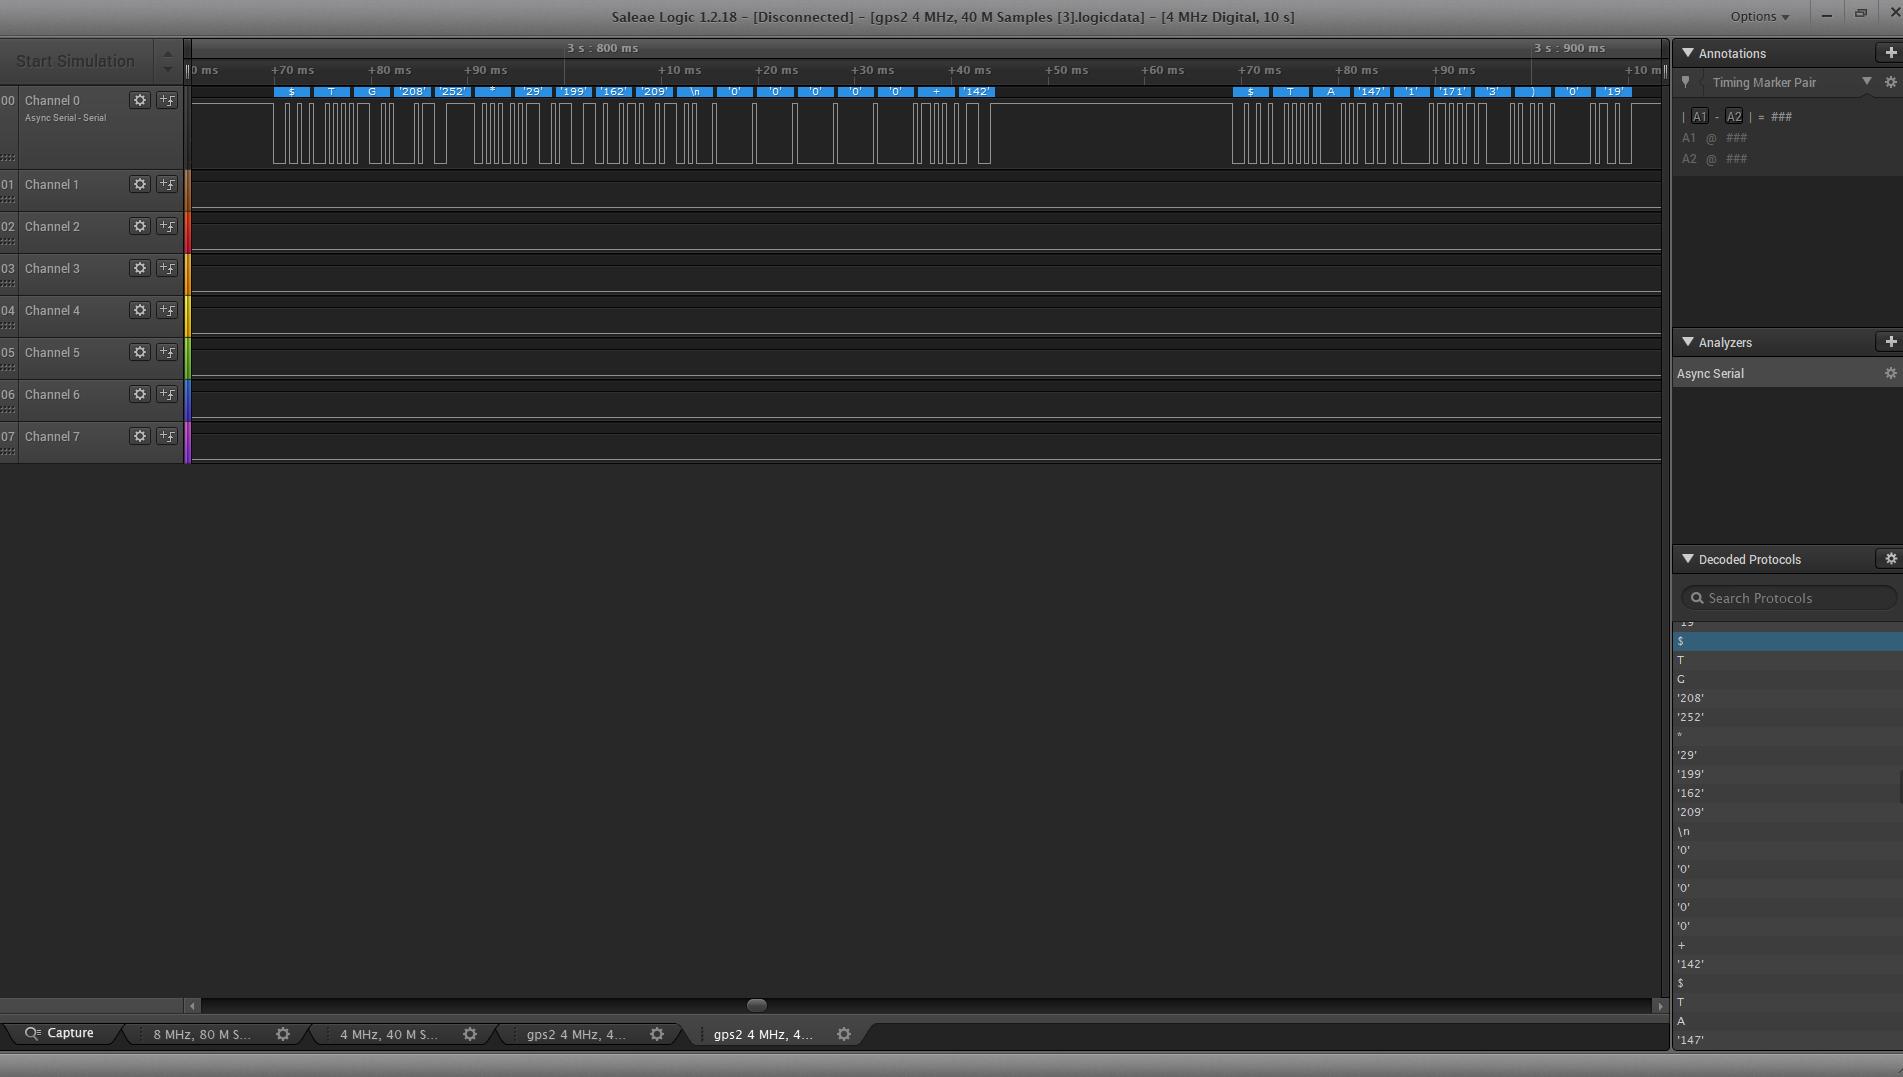 logic analyser screenshot - G and A frames